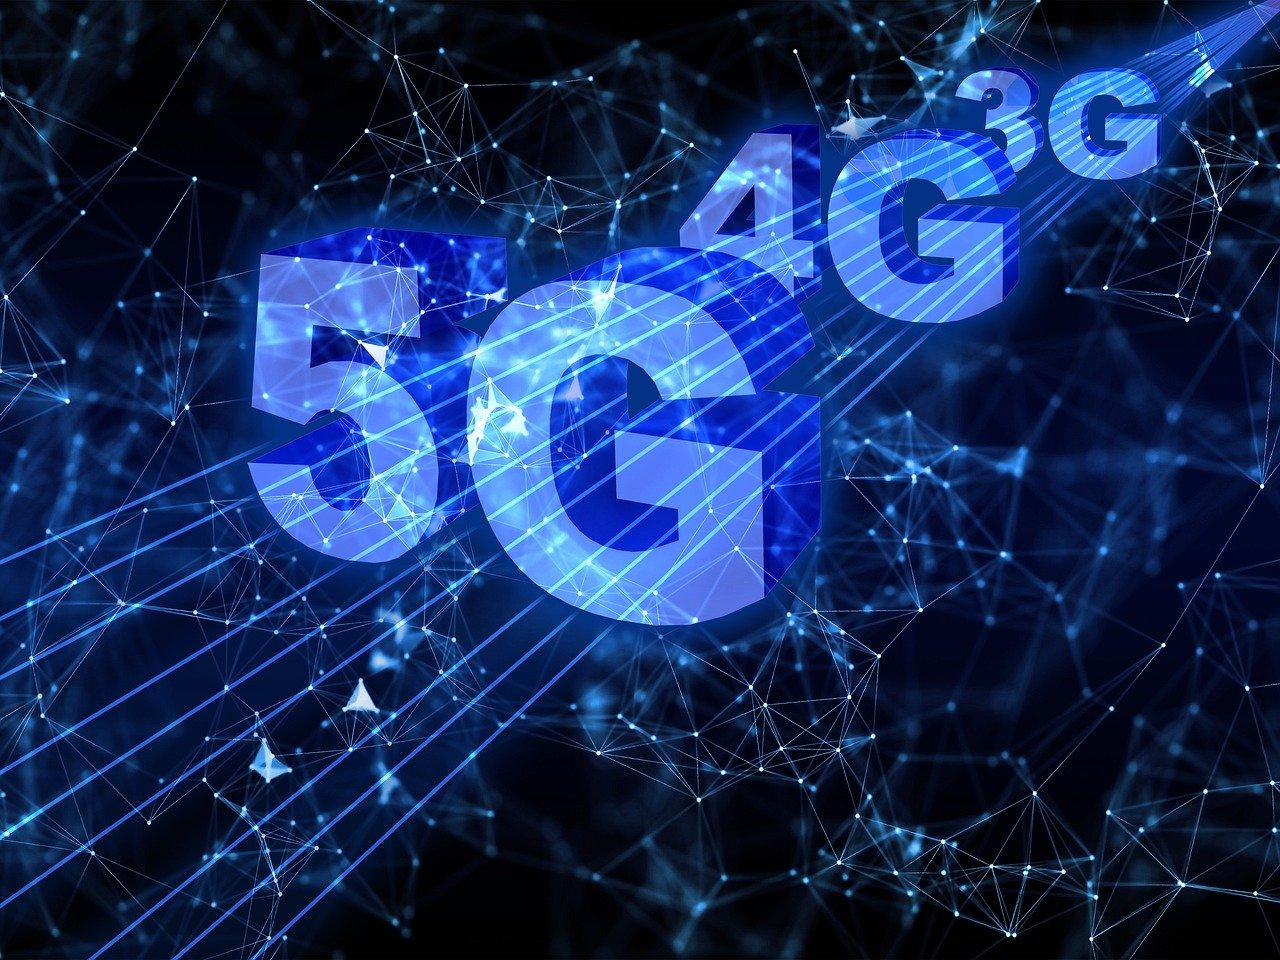 Read more about the article Ipari 5G technológia és a jövő gyára című online konferencia – 2020. június 11.